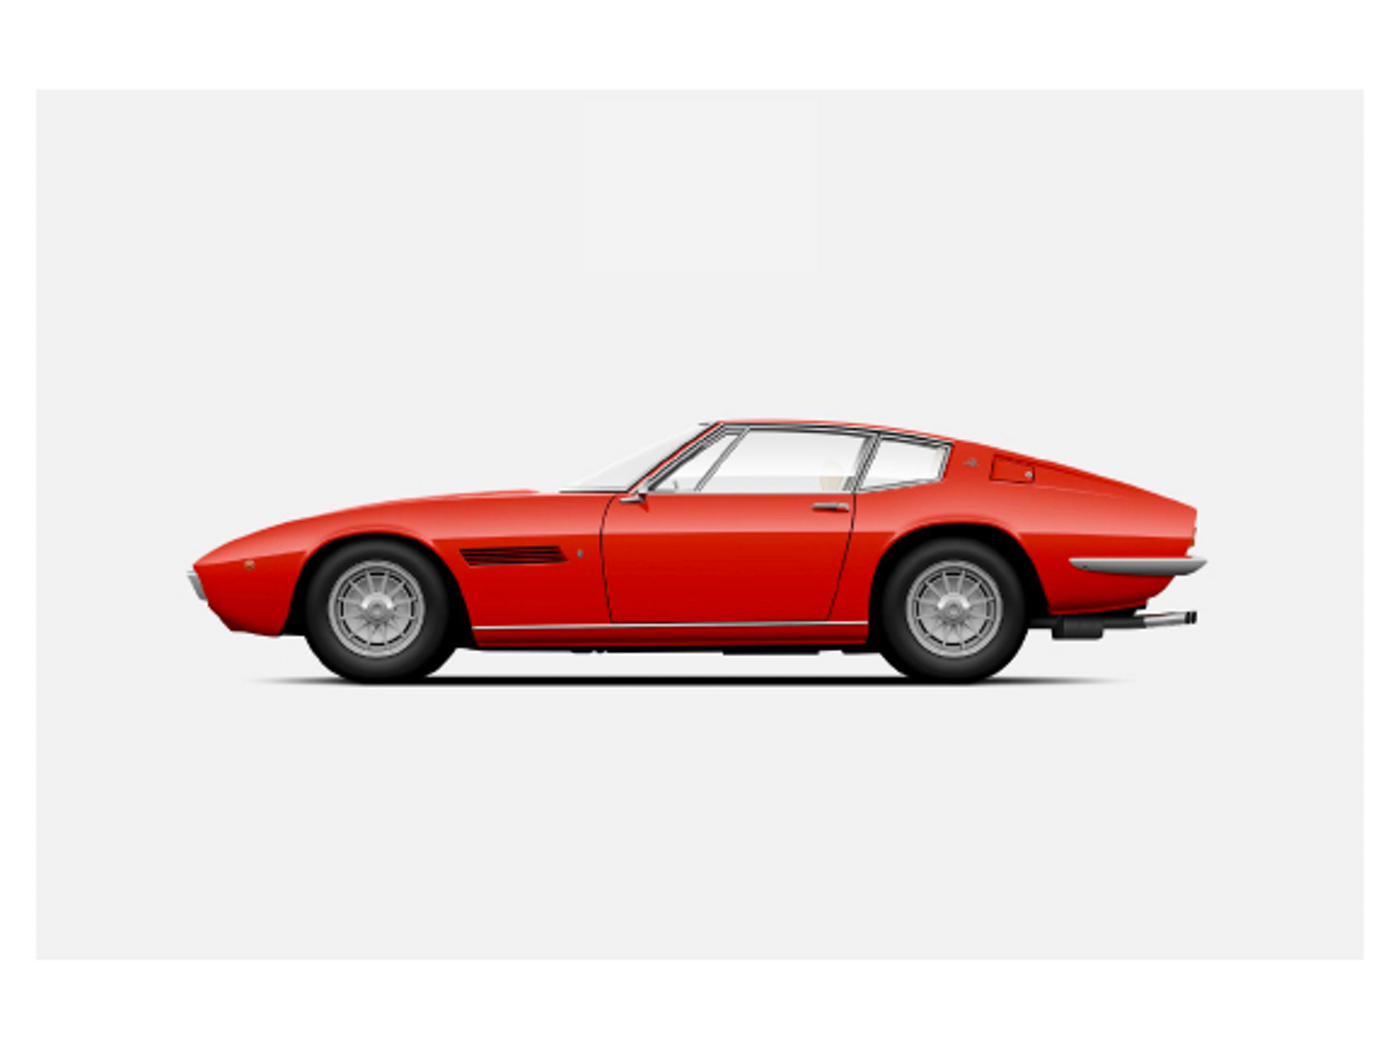 1970 Ghibli SS Coupé - Historische Maserati-Autos